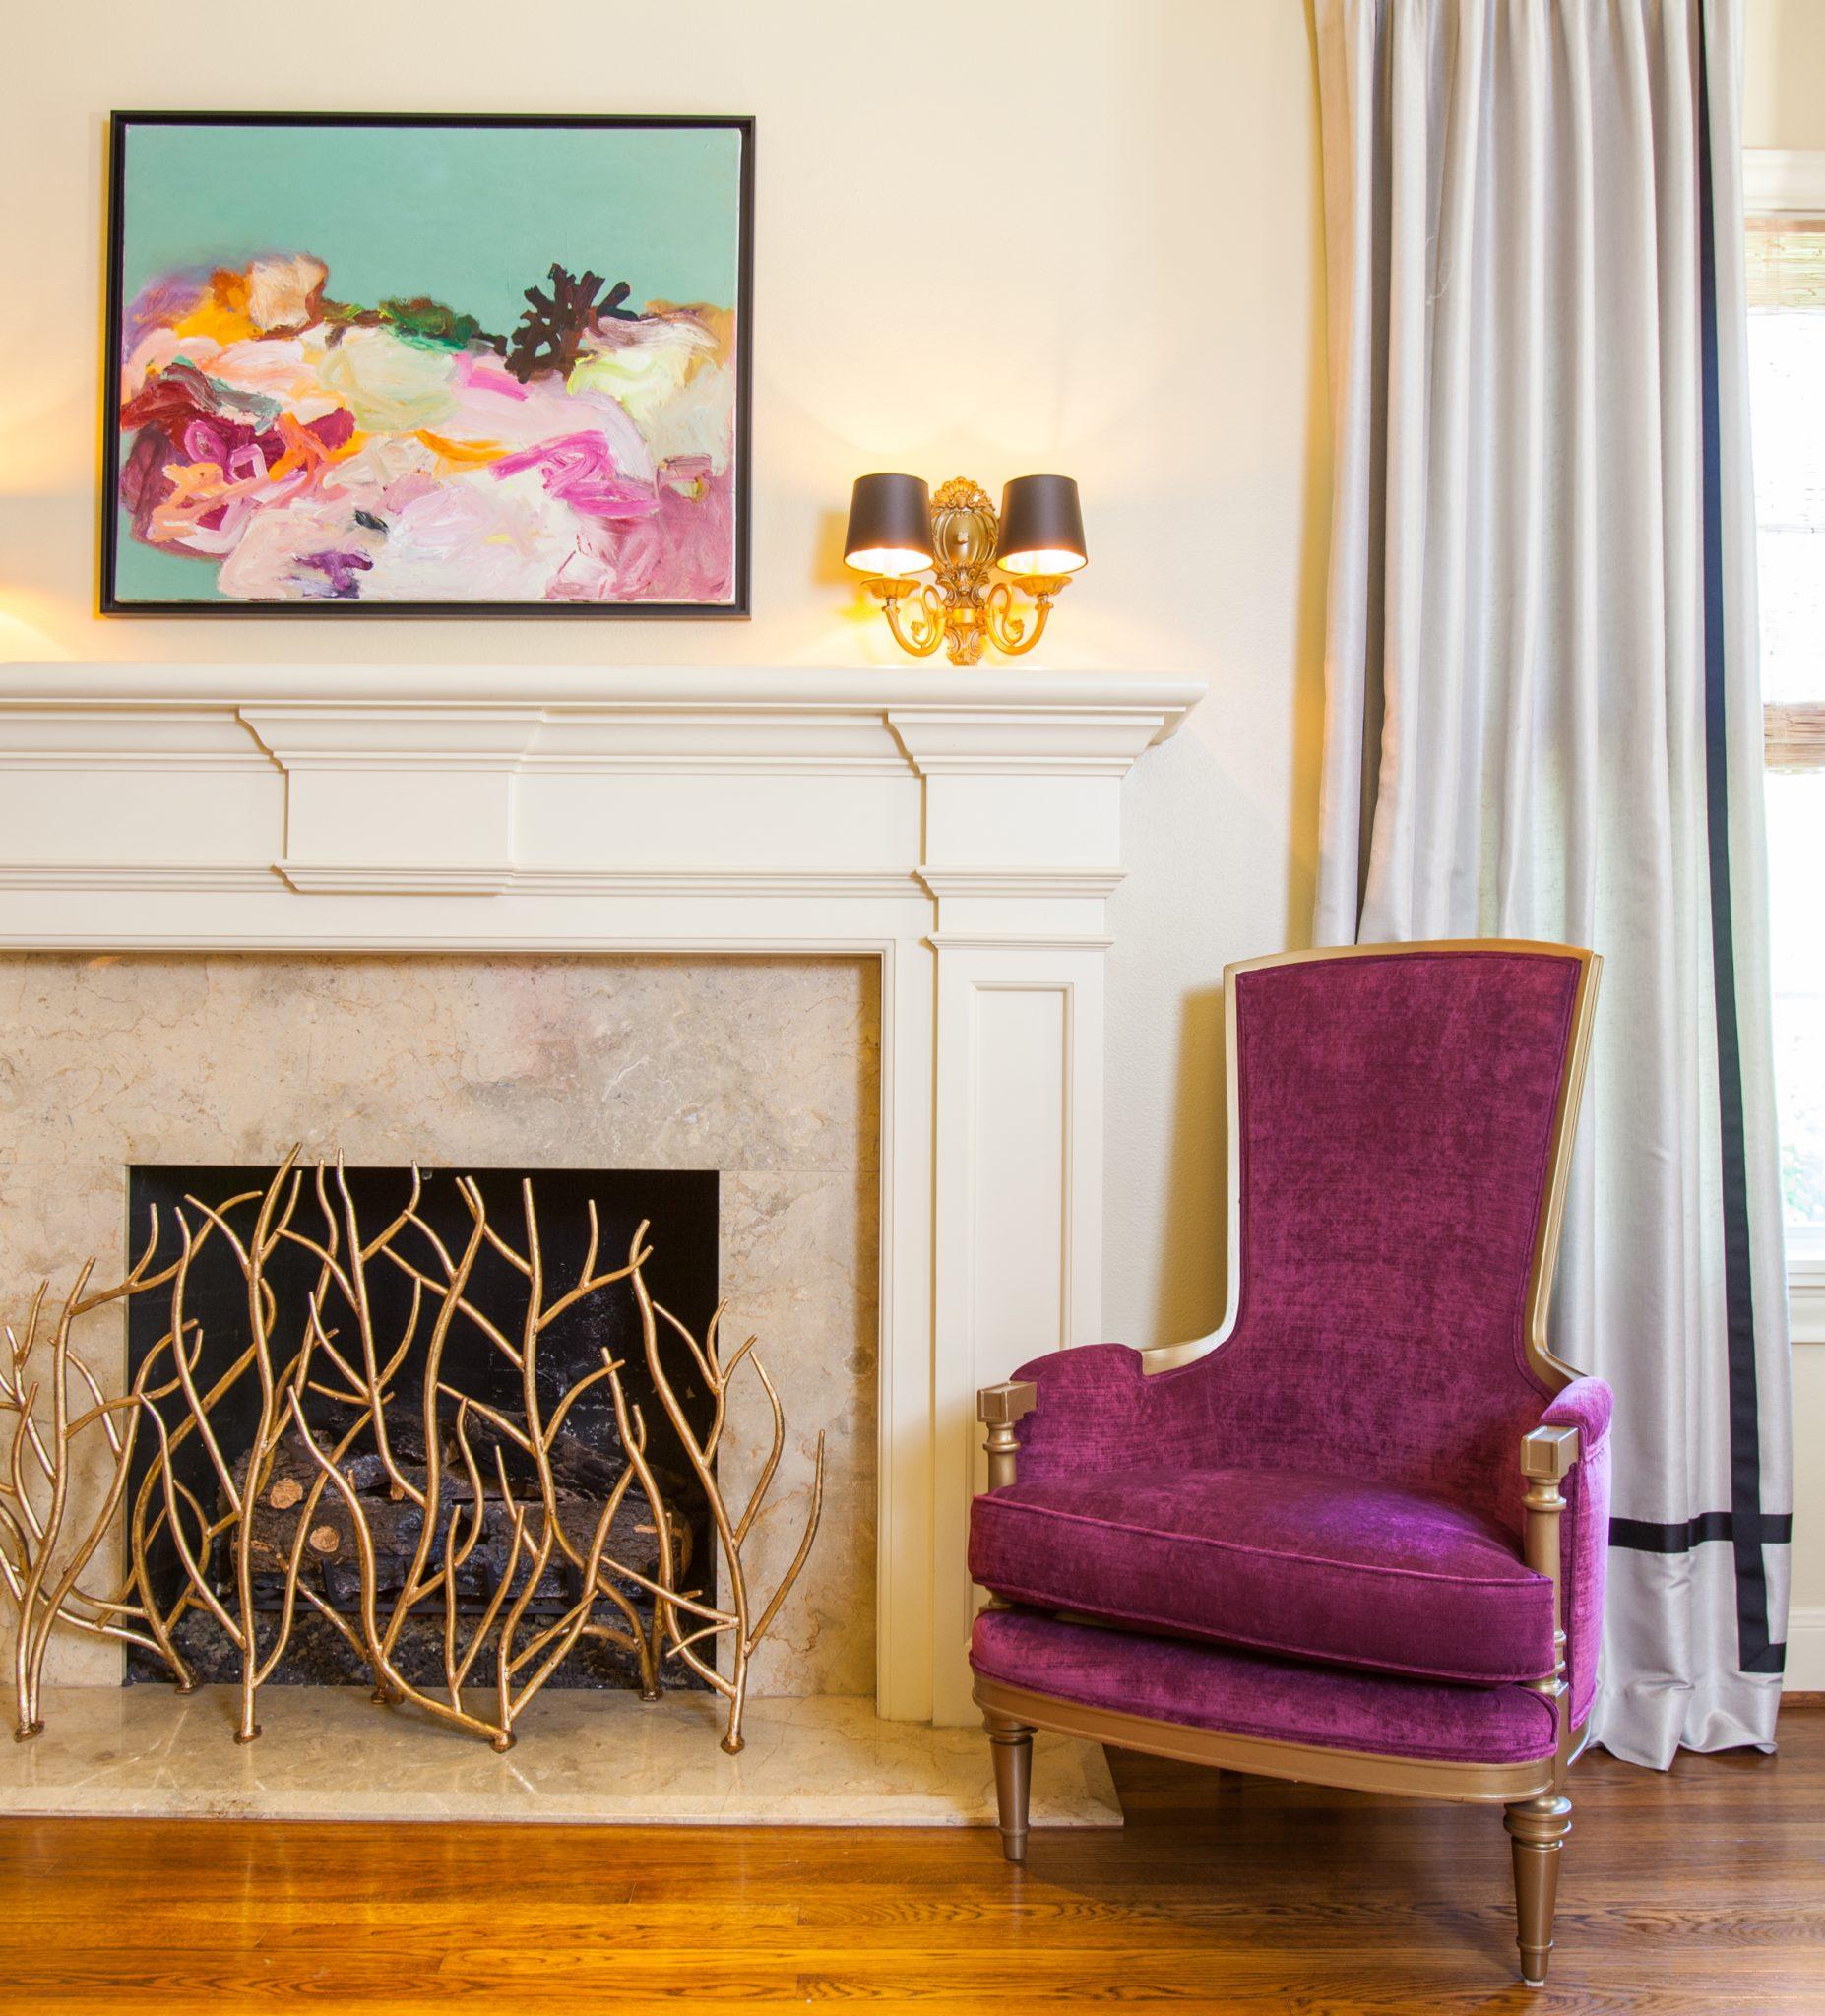 Southampton residence by Laura U, Inc.